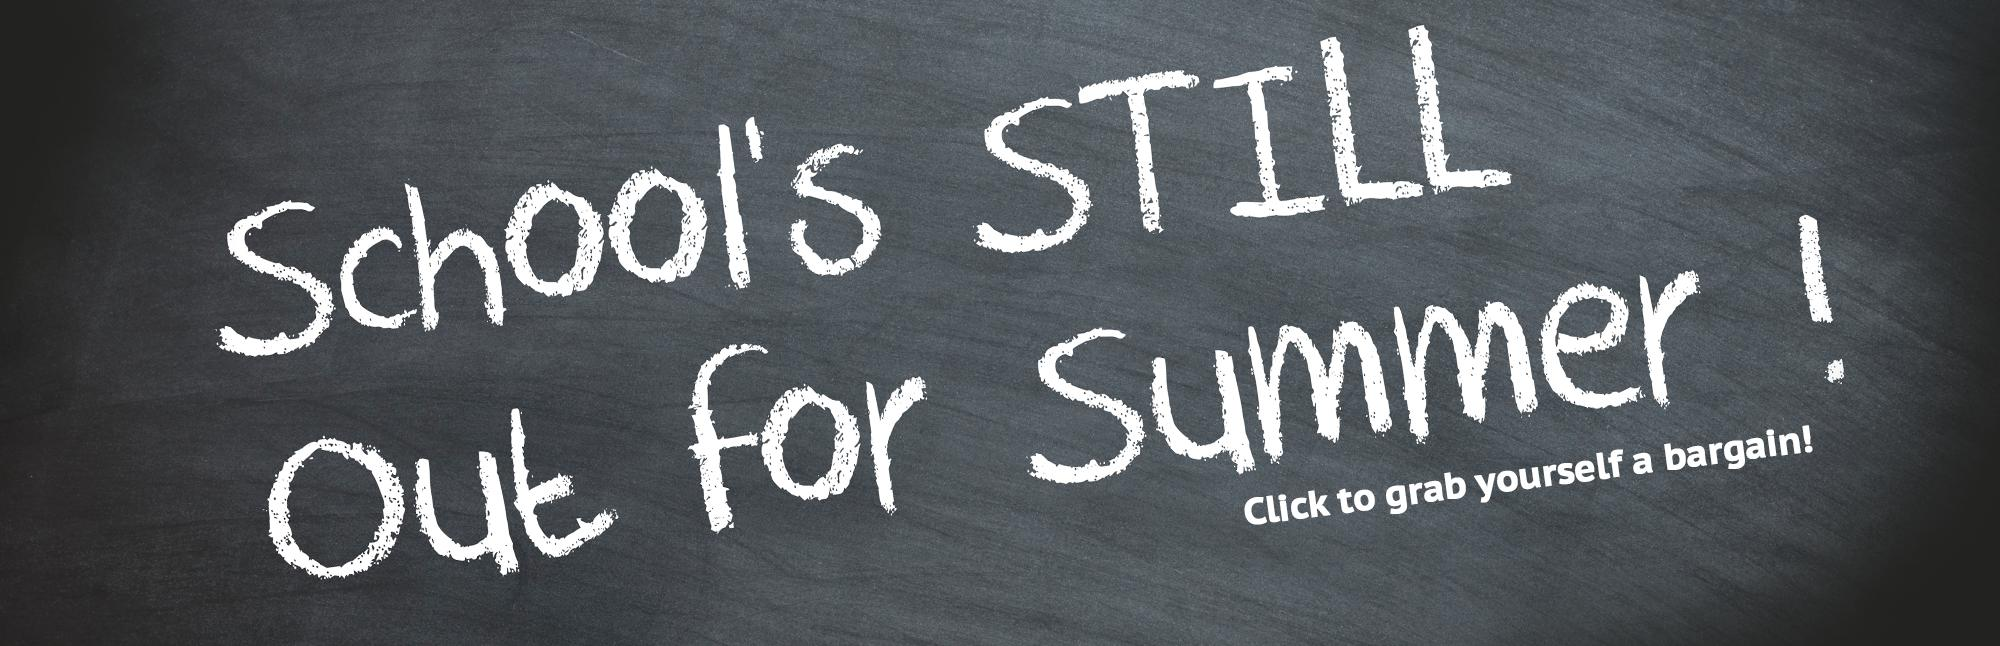 Schools STILL out for summer!